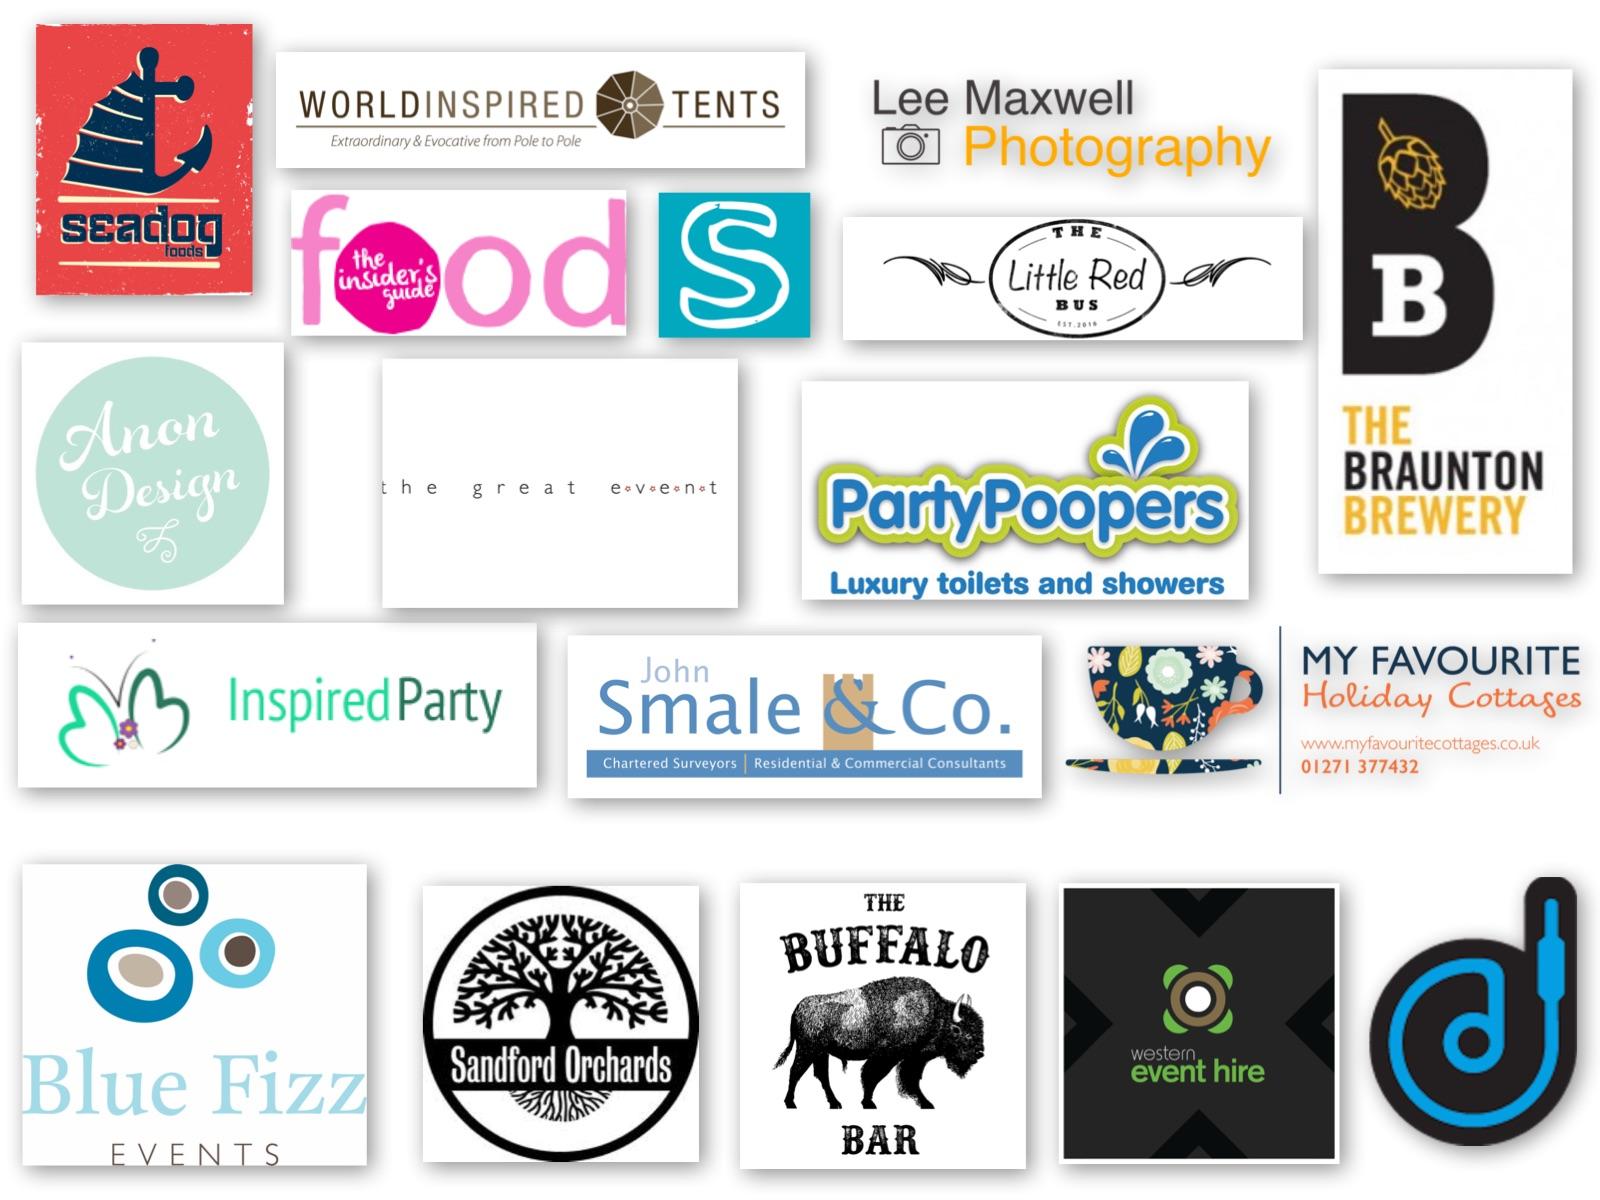 barefoot 2017 sponsors logos 4